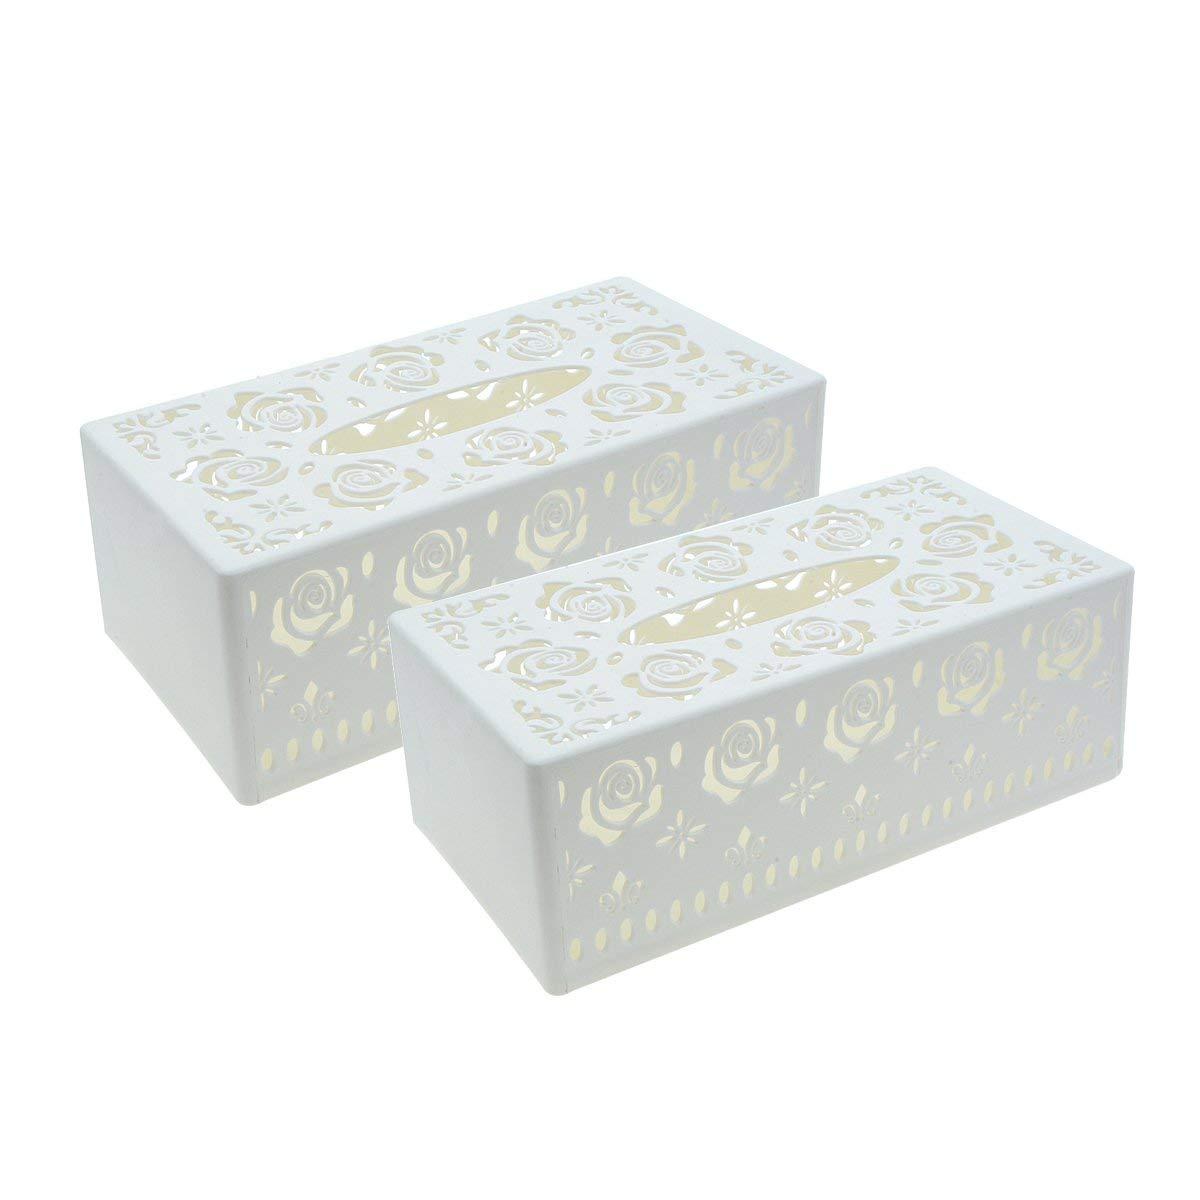 Saim Plastic Hollow Flower Pattern Facial Tissue Box Cover Holder, 2Pcs (White)